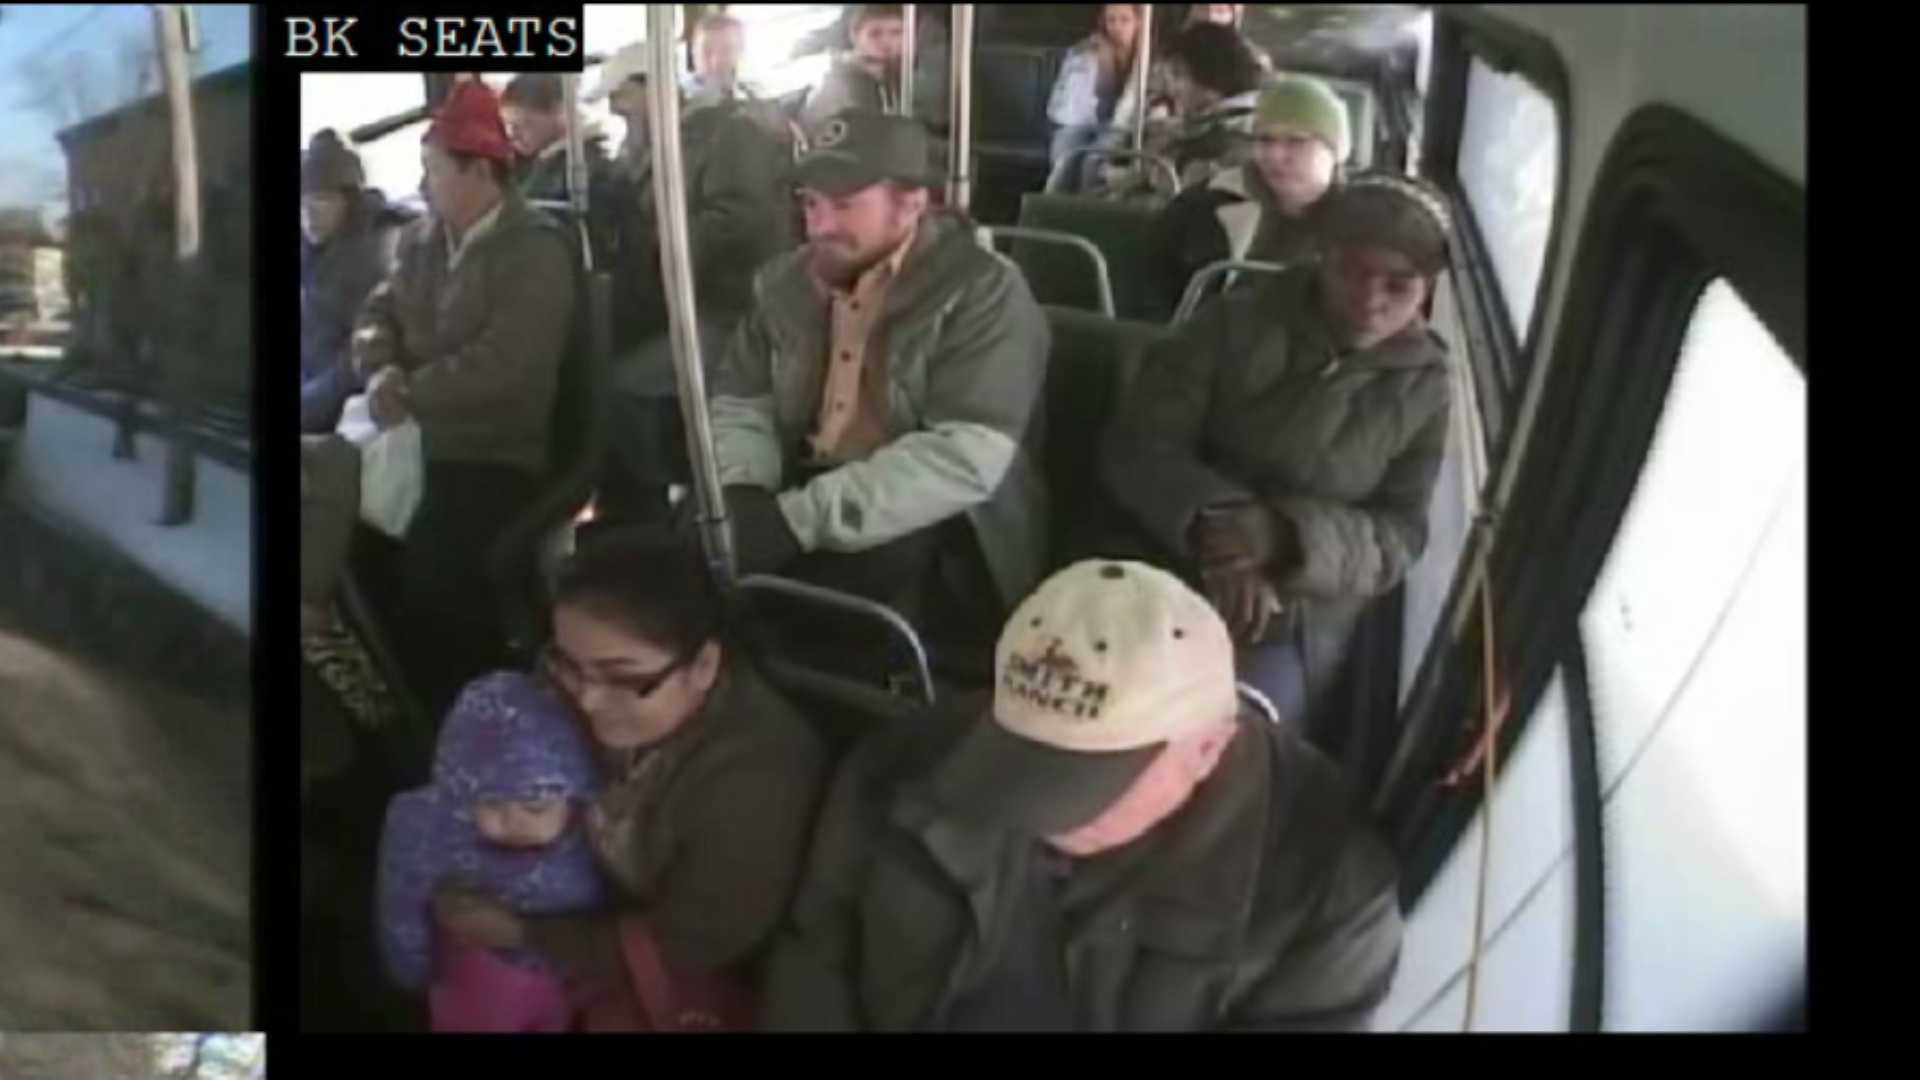 03-06-13 Police identify suspect in bus vandalism - img